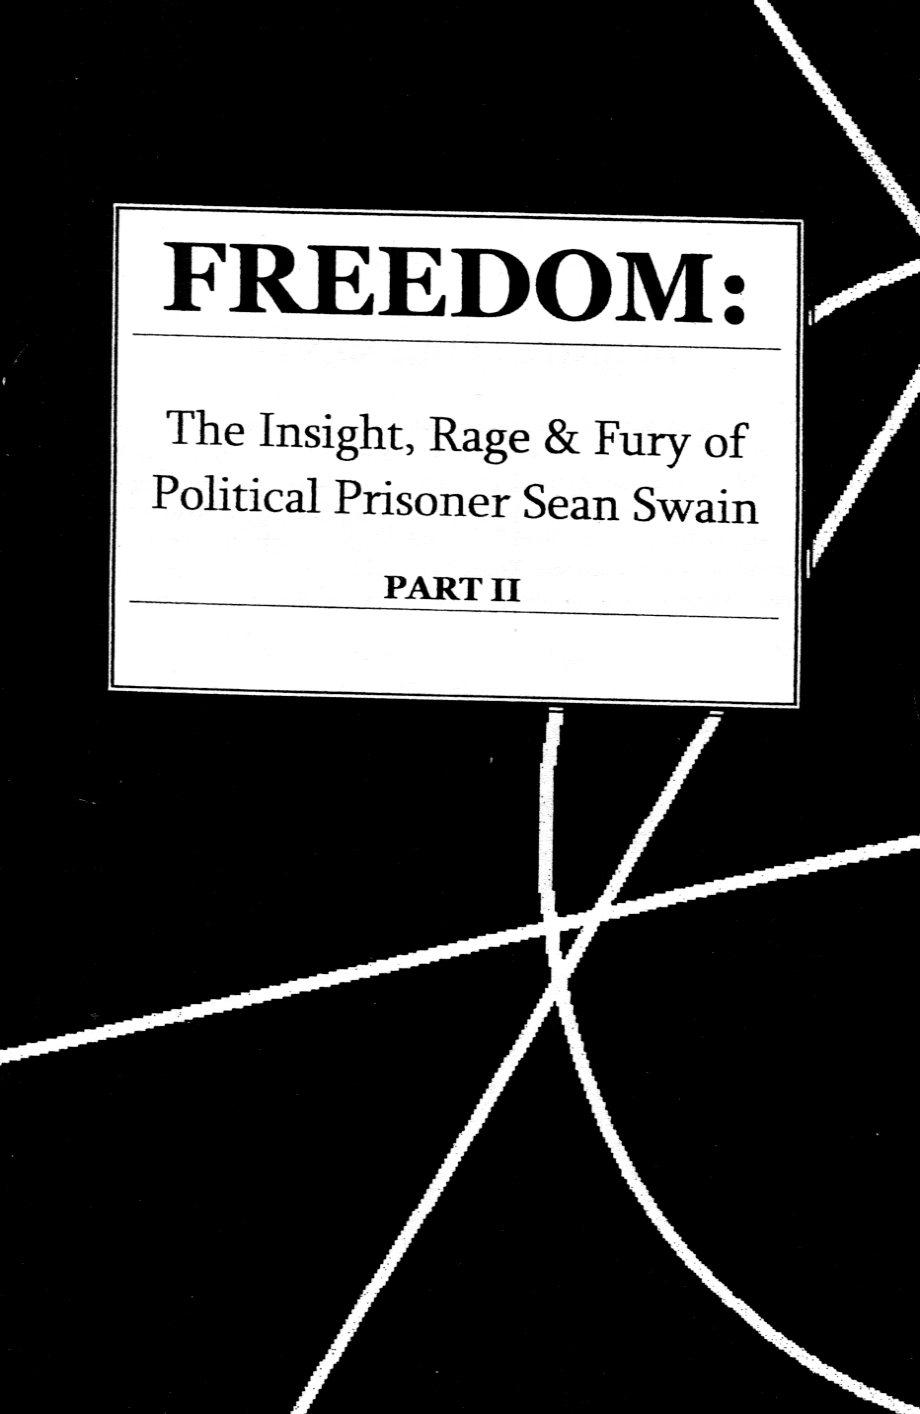 freedom2002